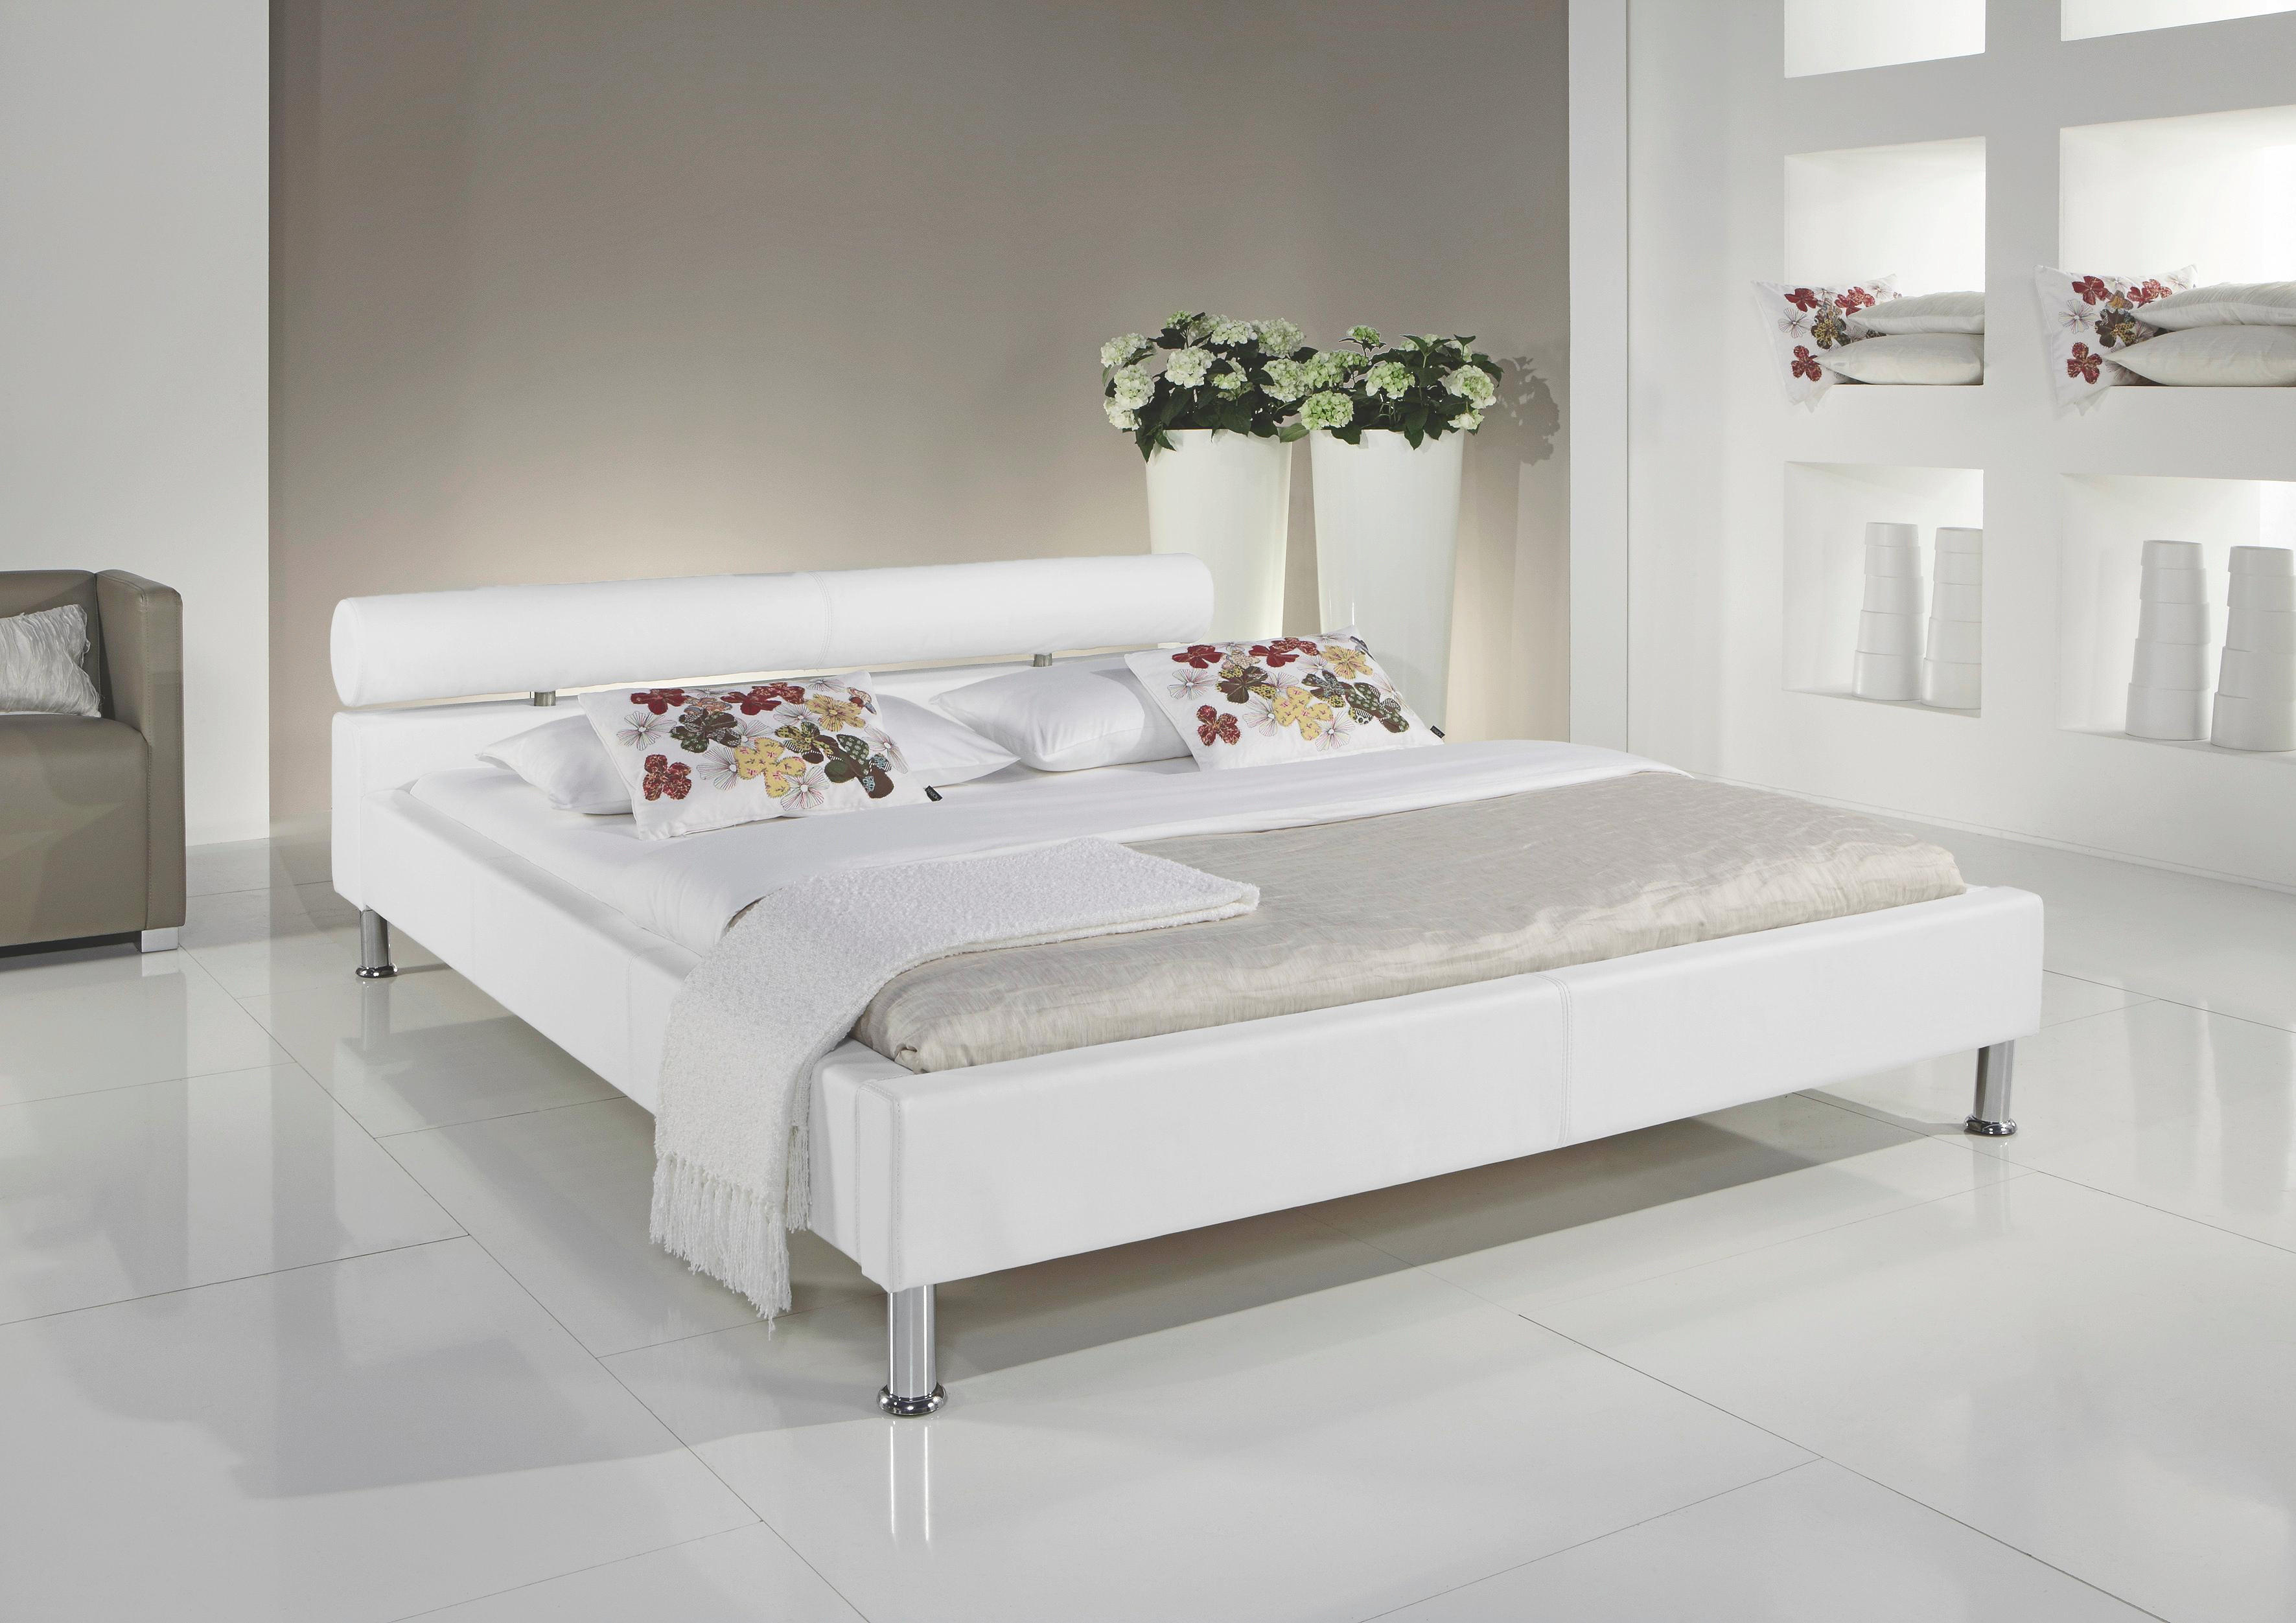 POLSTERBETT 140 cm   x 200 cm   in Textil Weiß - Chromfarben/Weiß, Design, Textil/Metall (140/200cm) - CARRYHOME